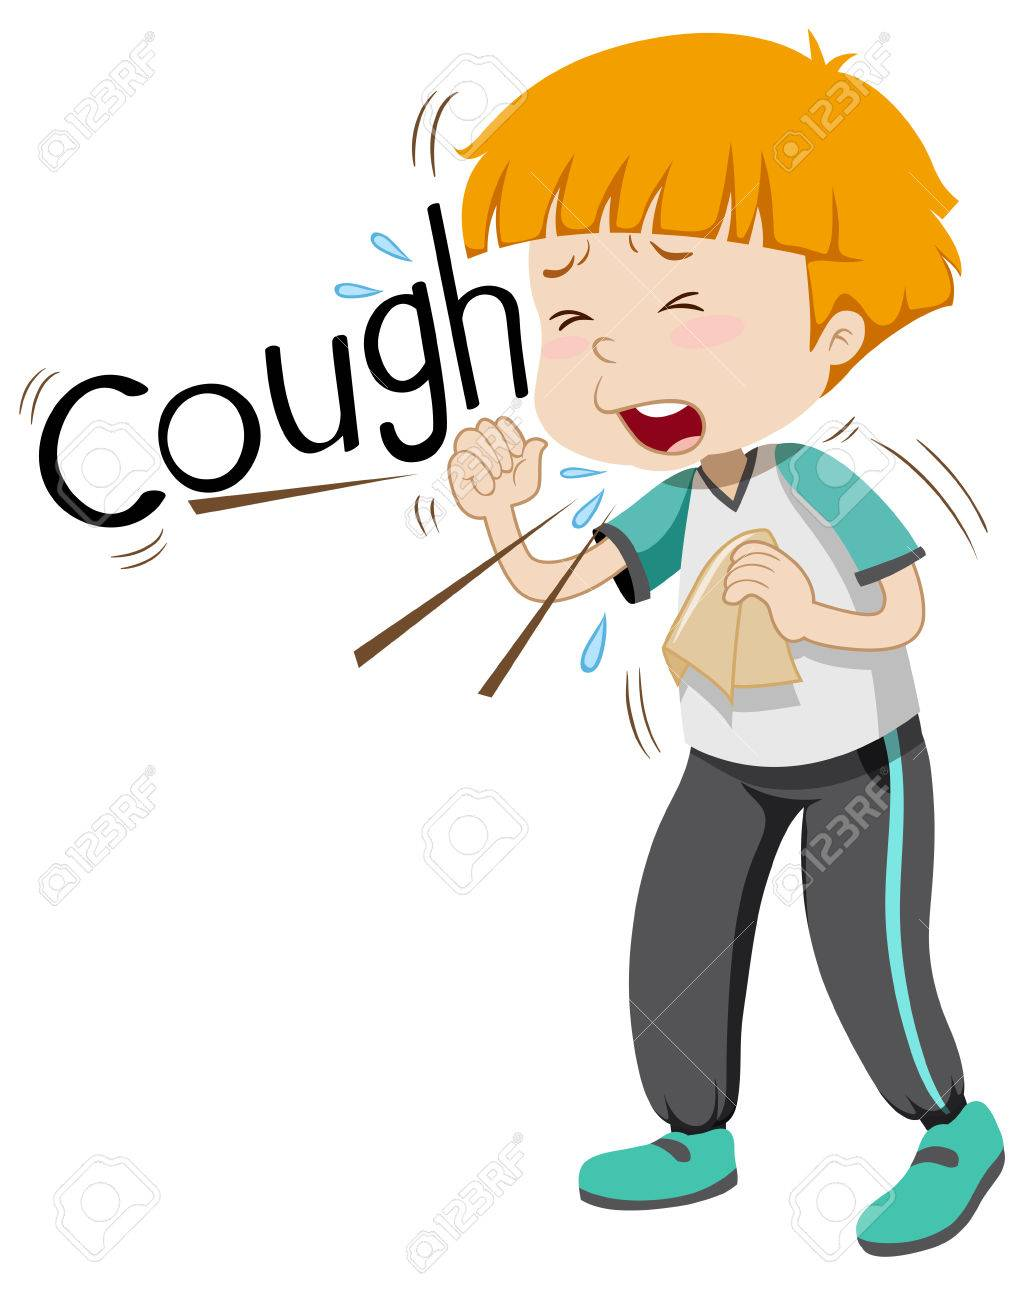 Sick boy coughing hard illustration.